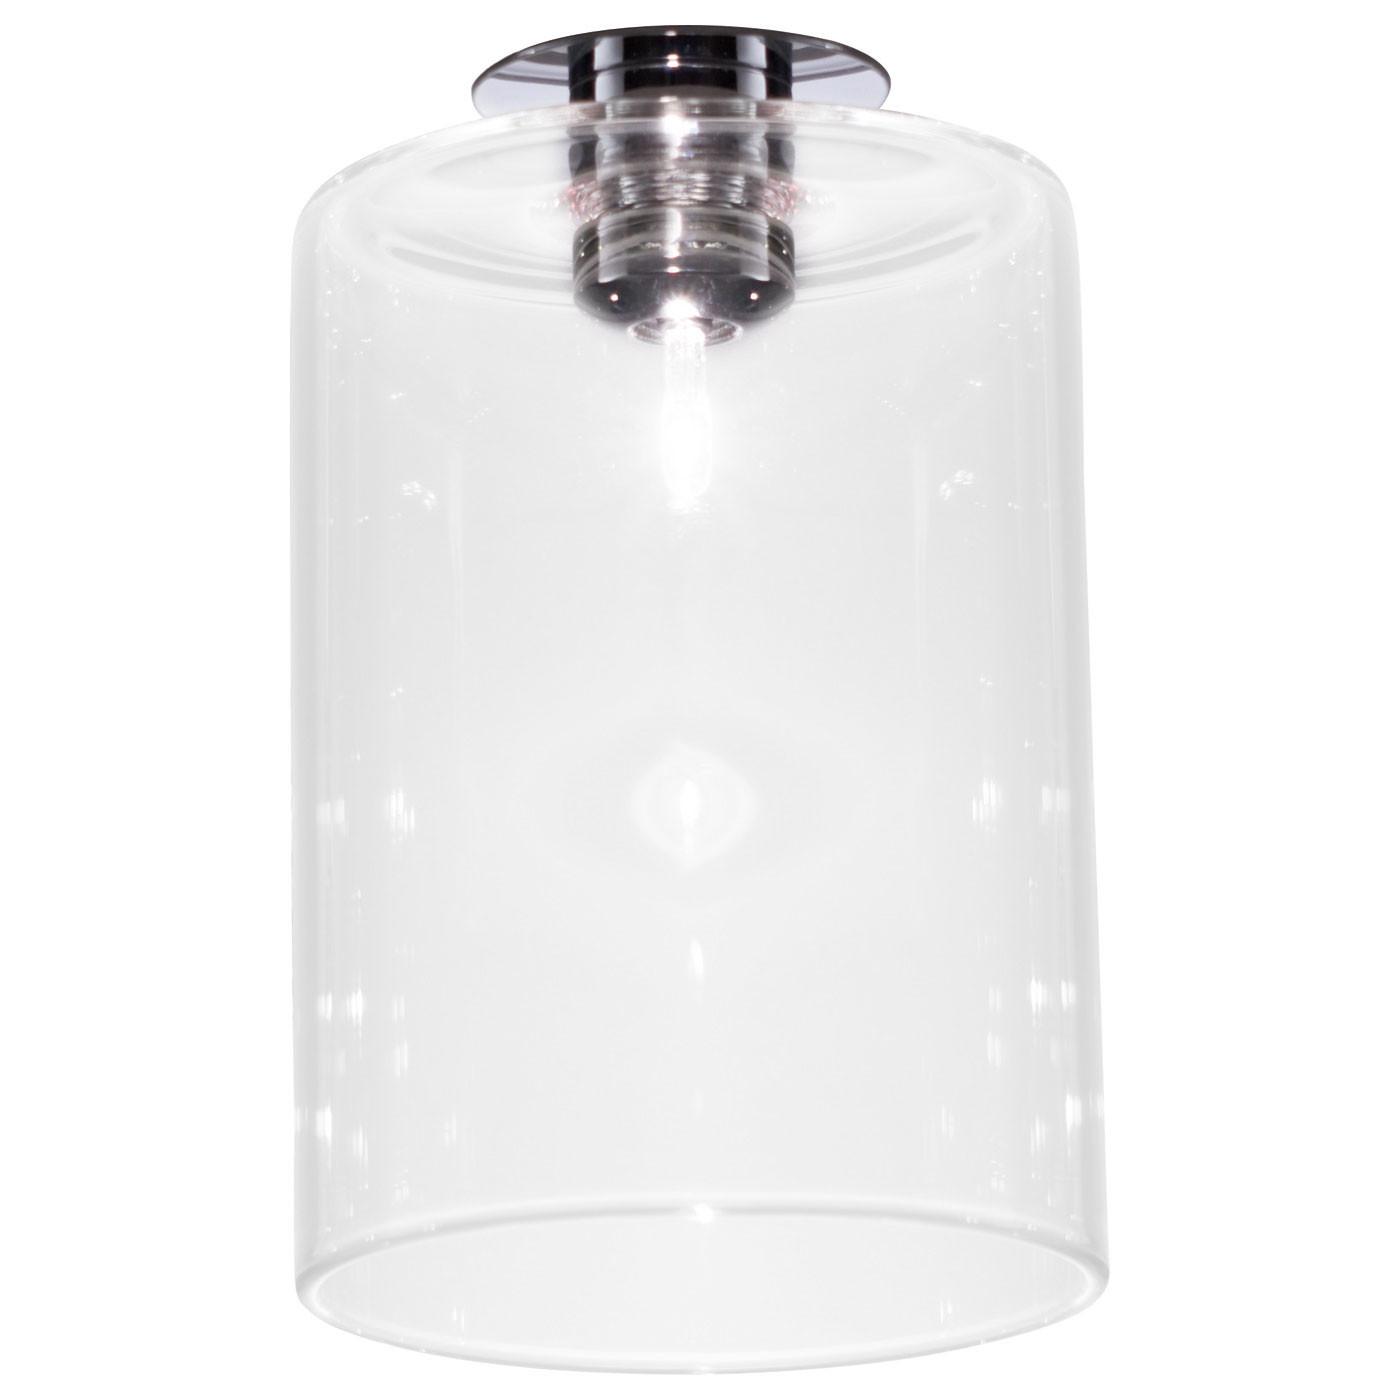 Axo Light Spillray PI Deckeneinbauleuchte